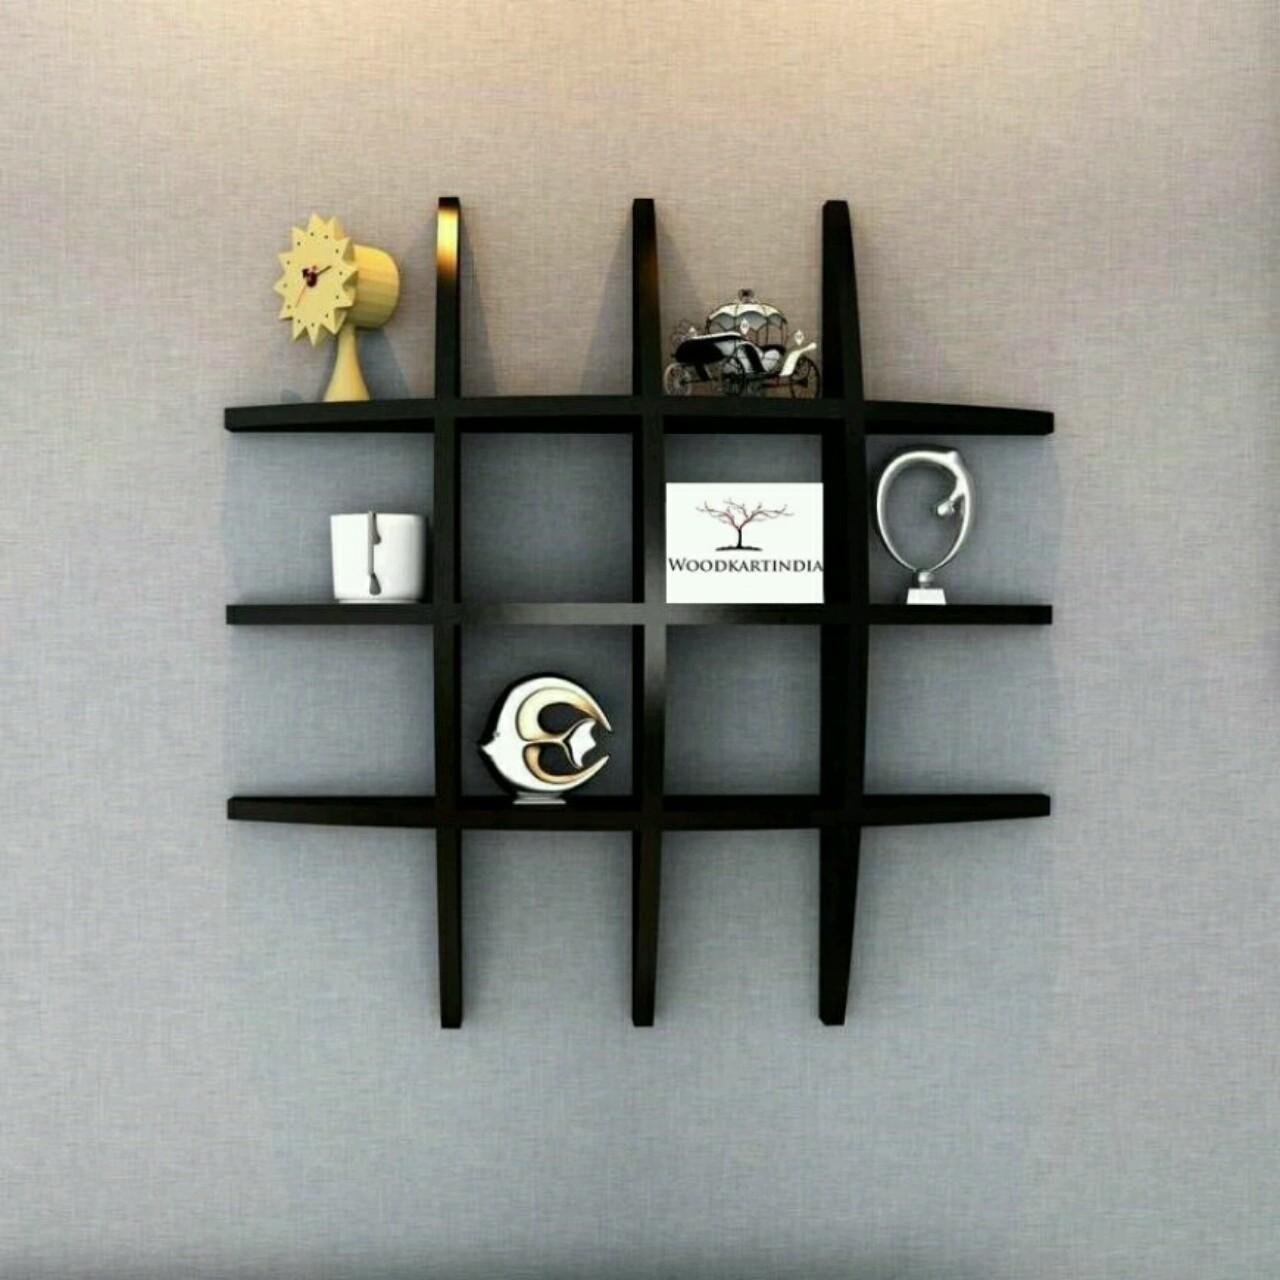 View OnlinePurchas Net Shape Wooden Wall Shelf(Number of Shelves - 6, Black) Furniture (OnlinePurchas)